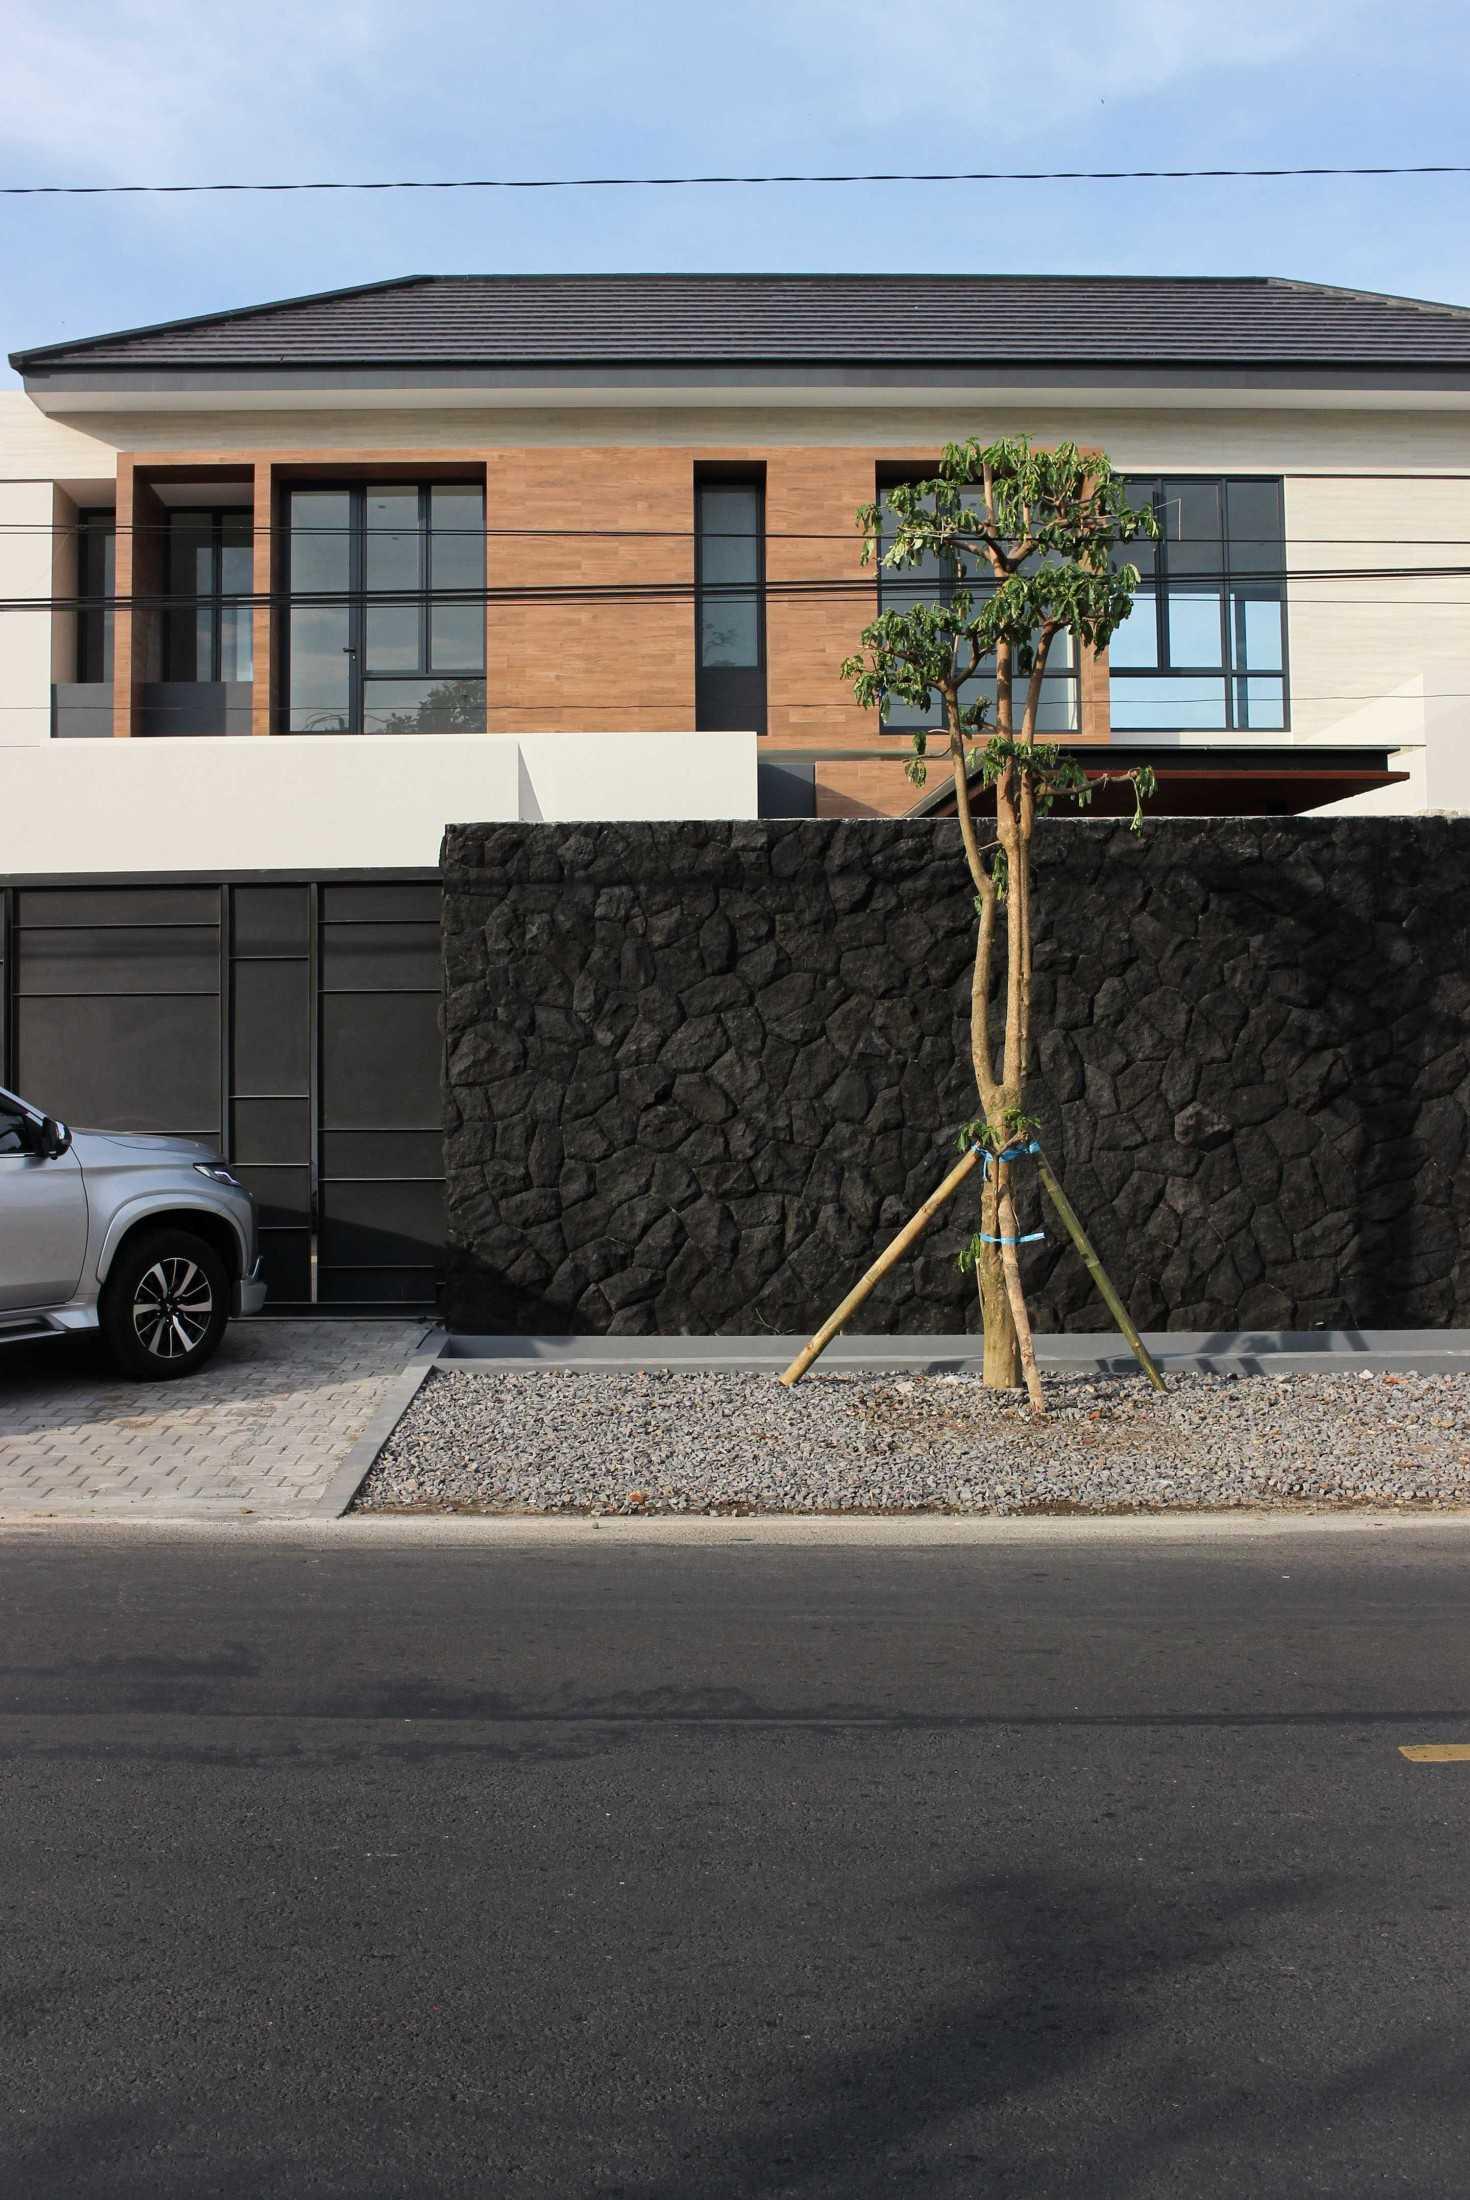 Y0 Design Architect S House Kec. Srono, Kabupaten Banyuwangi, Jawa Timur, Indonesia Kec. Srono, Kabupaten Banyuwangi, Jawa Timur, Indonesia Yohanes-Iswara-Limandjaya-S-House  121075